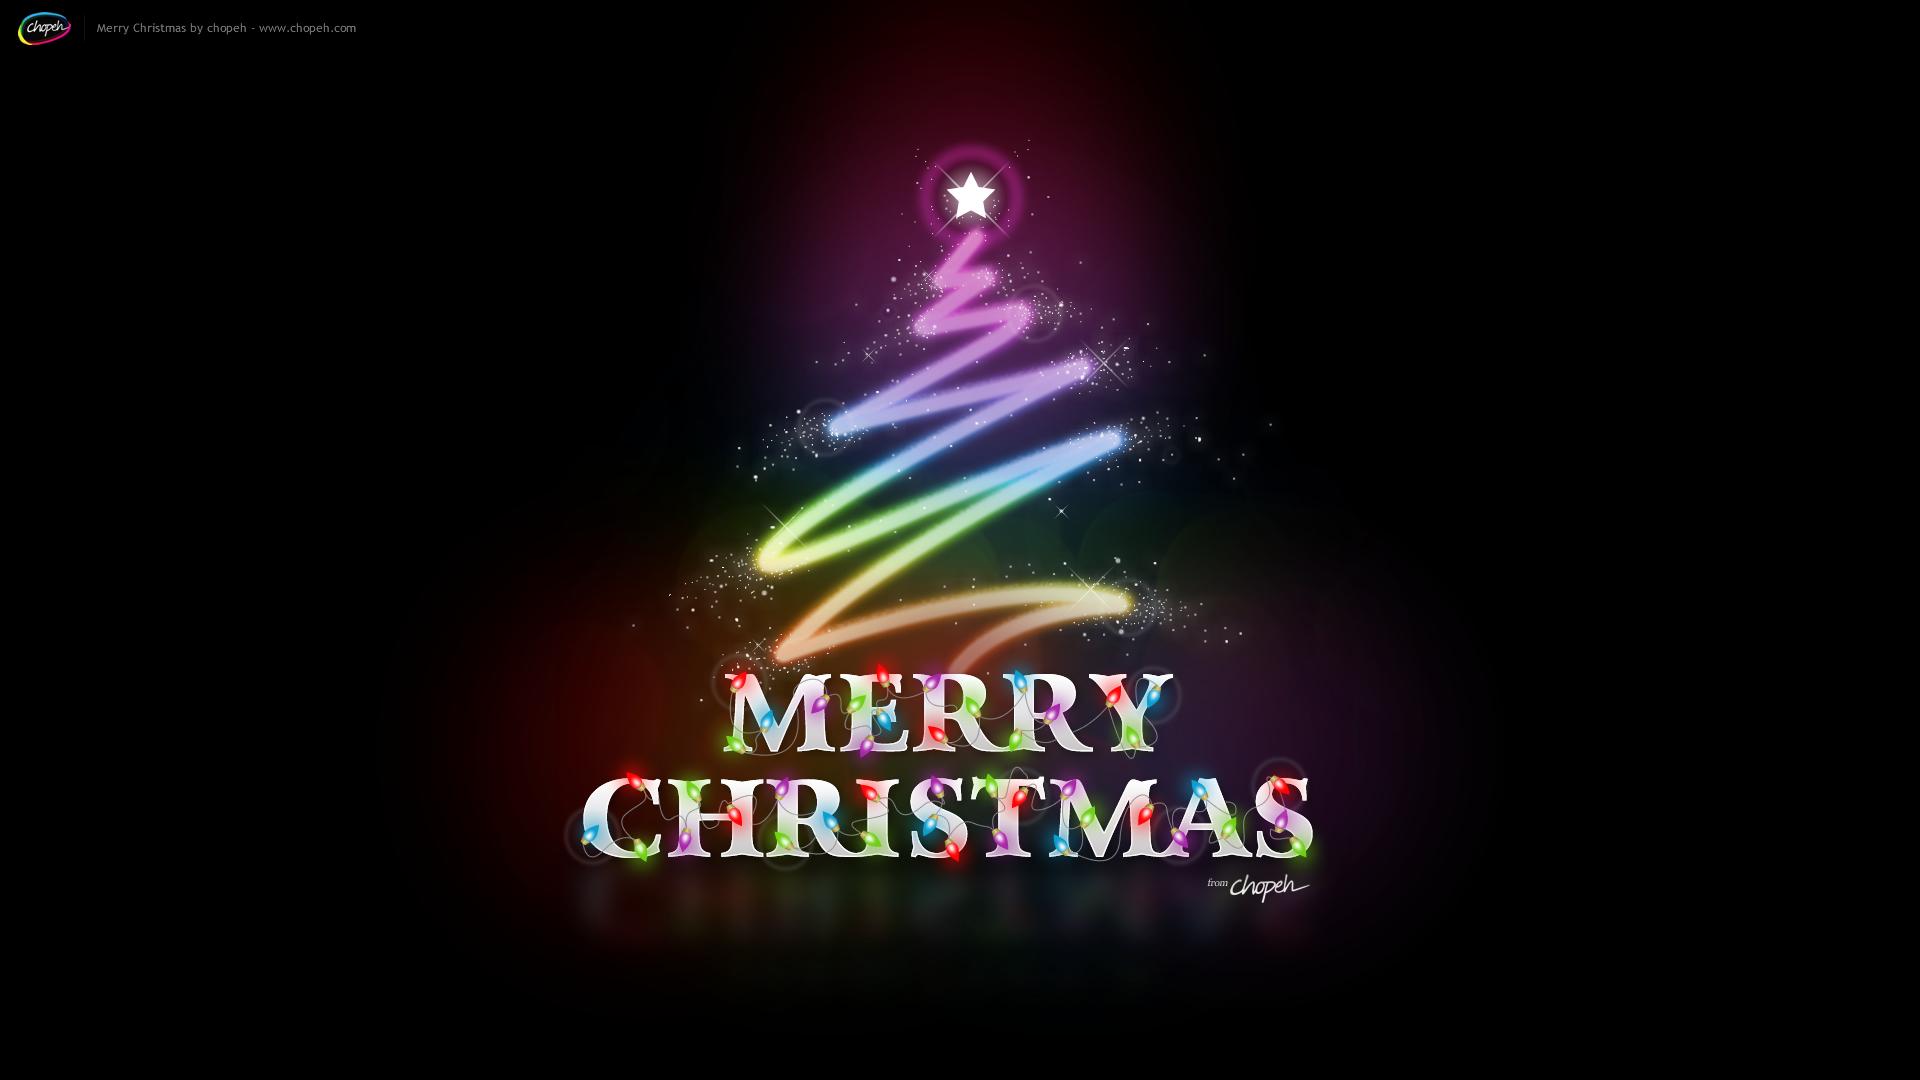 Merry_Christmas_by_chopeh